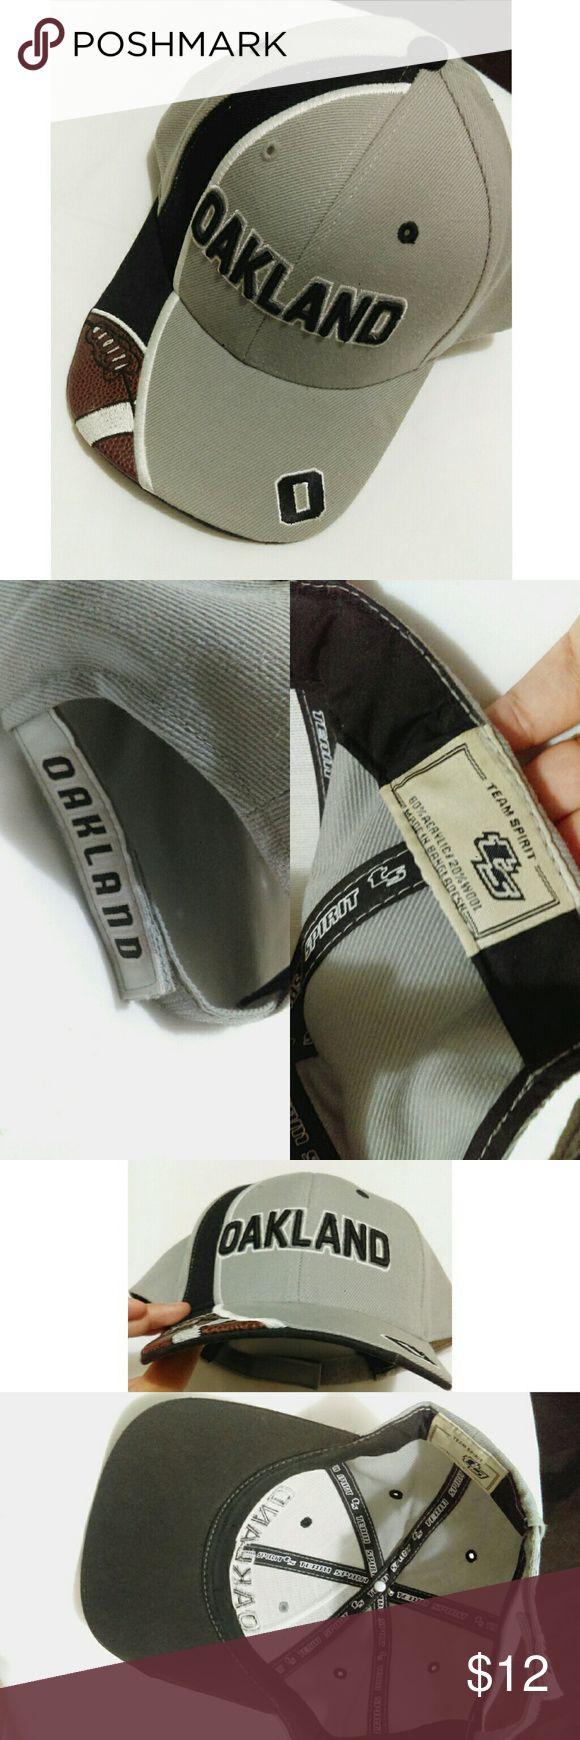 Oakland baseball cap Gray black & white Raiders colors. Adjustable velcro strap. Perfect game-day cap. Accessories Hats